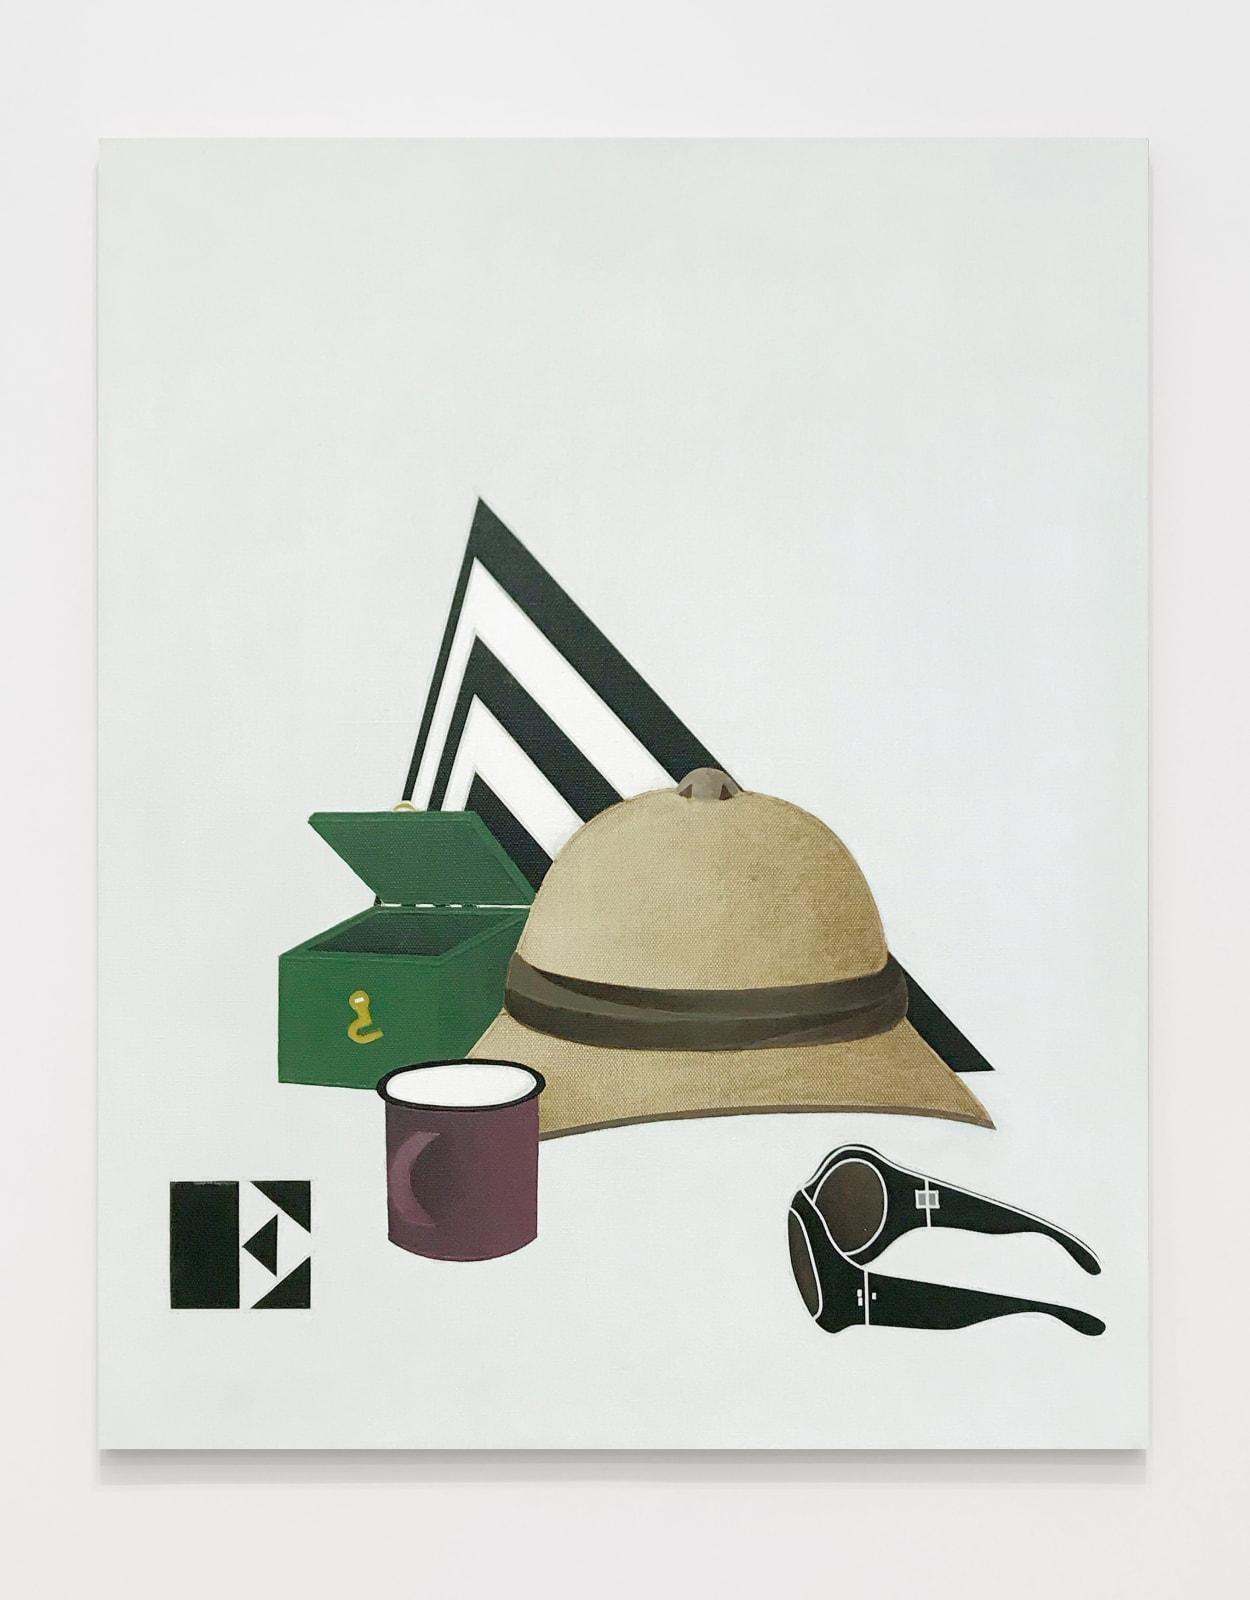 Viaggio in Italia / I Travel to Italy 1971 Acrylic on canvas 31 7/8 x 25 5/8 inches (81 x 65 cm)